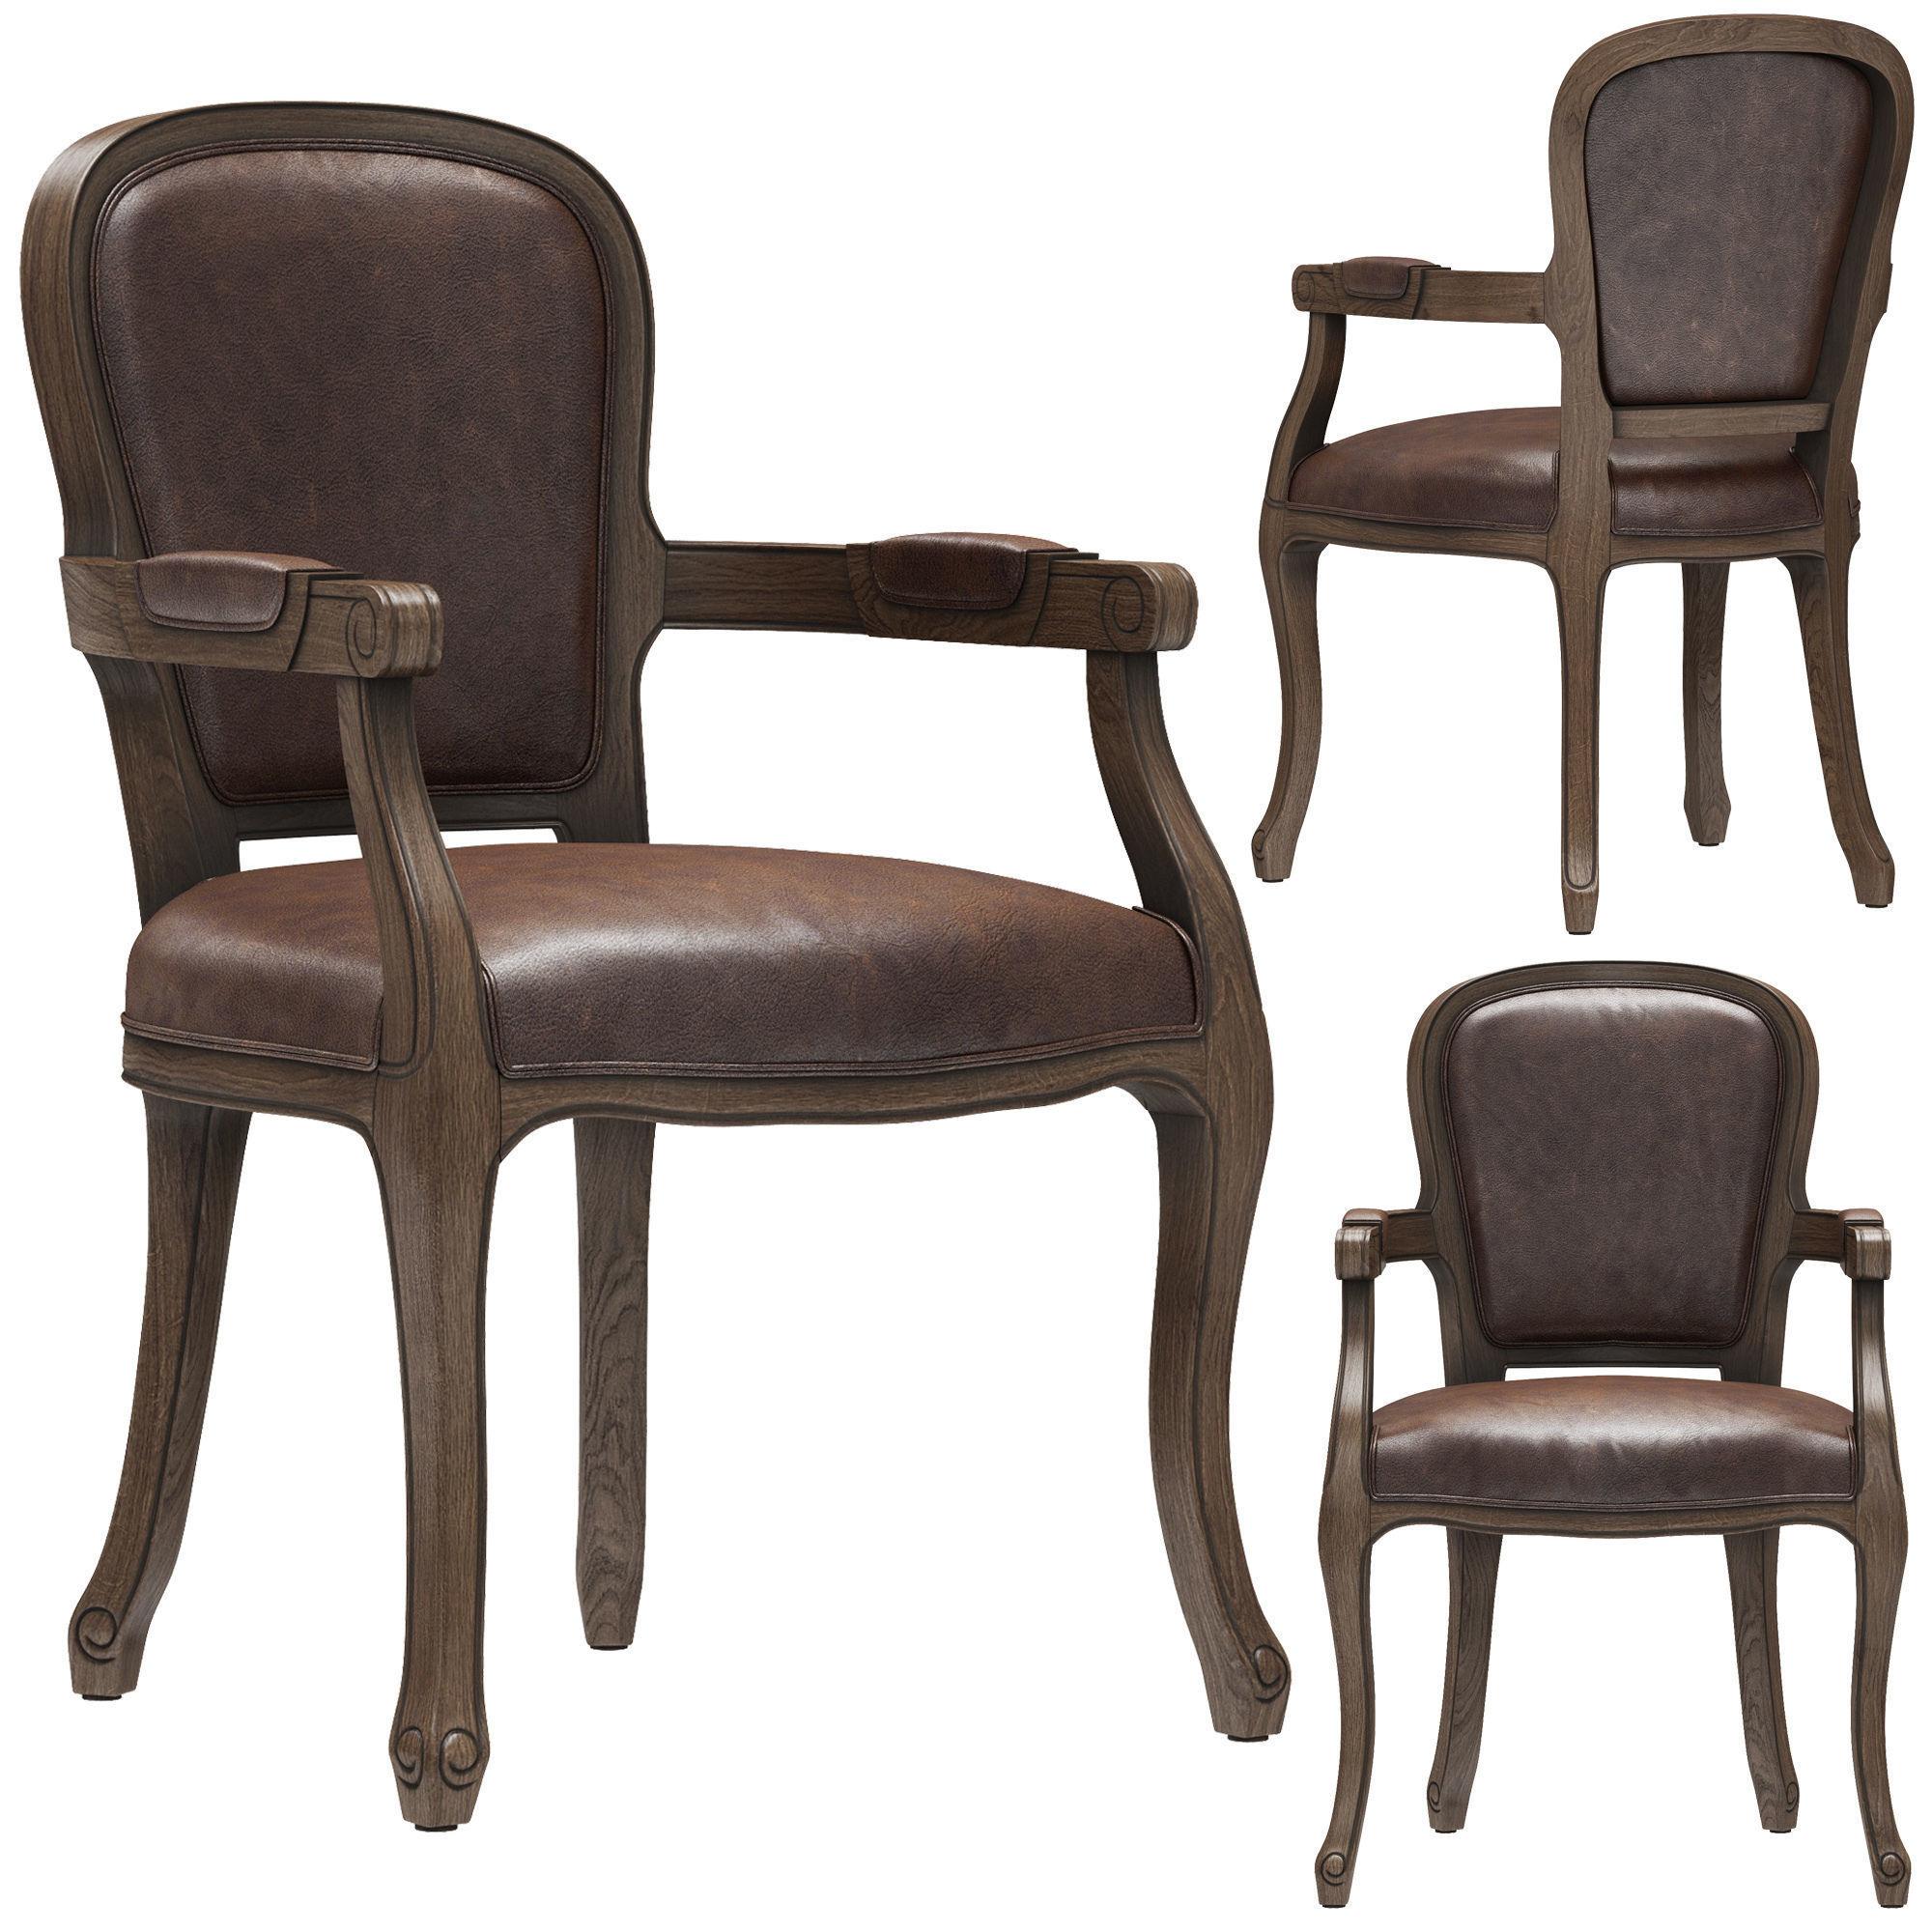 Home Concept Jean-Paul Dining Armchair